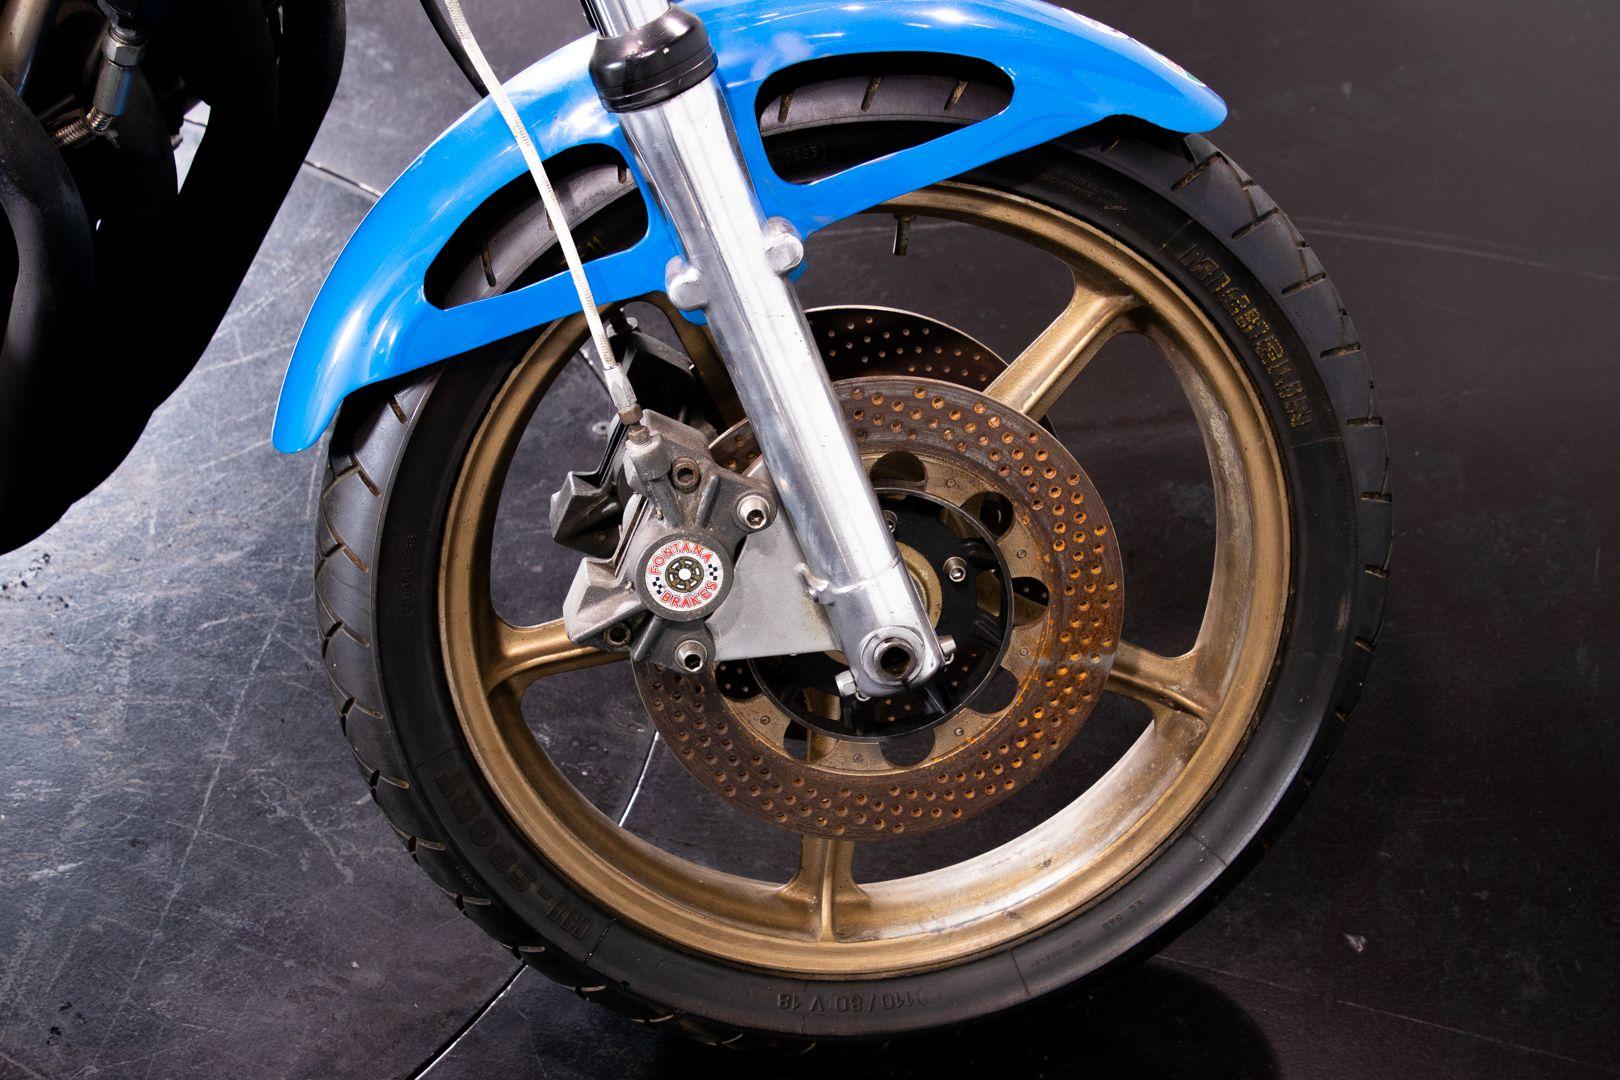 1980 Kawasaki Segoni 900 Testa Nera 74923